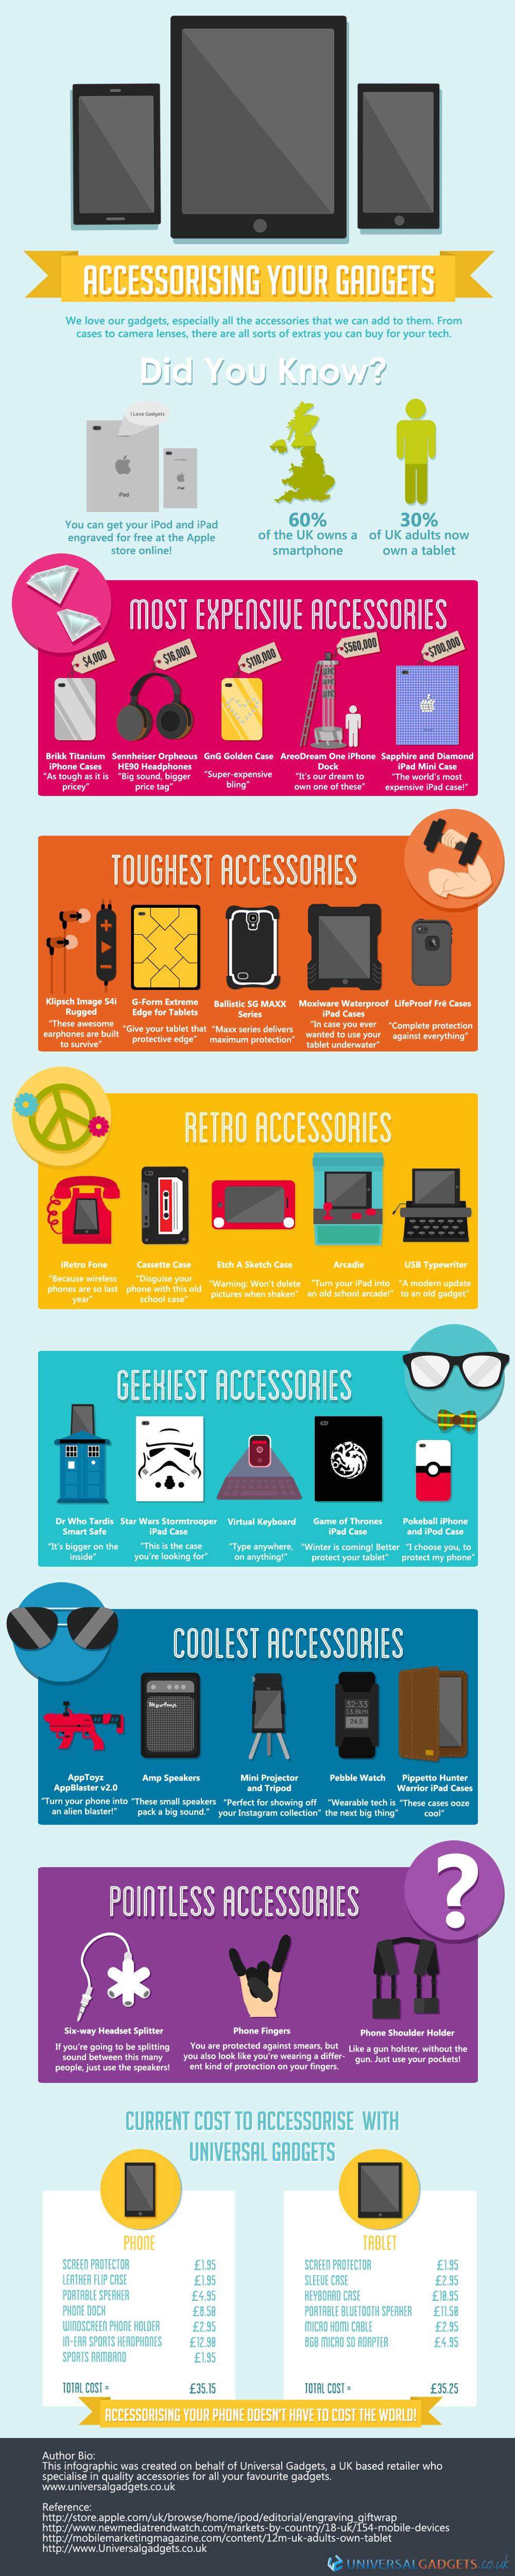 Accessorising Your Gadgets